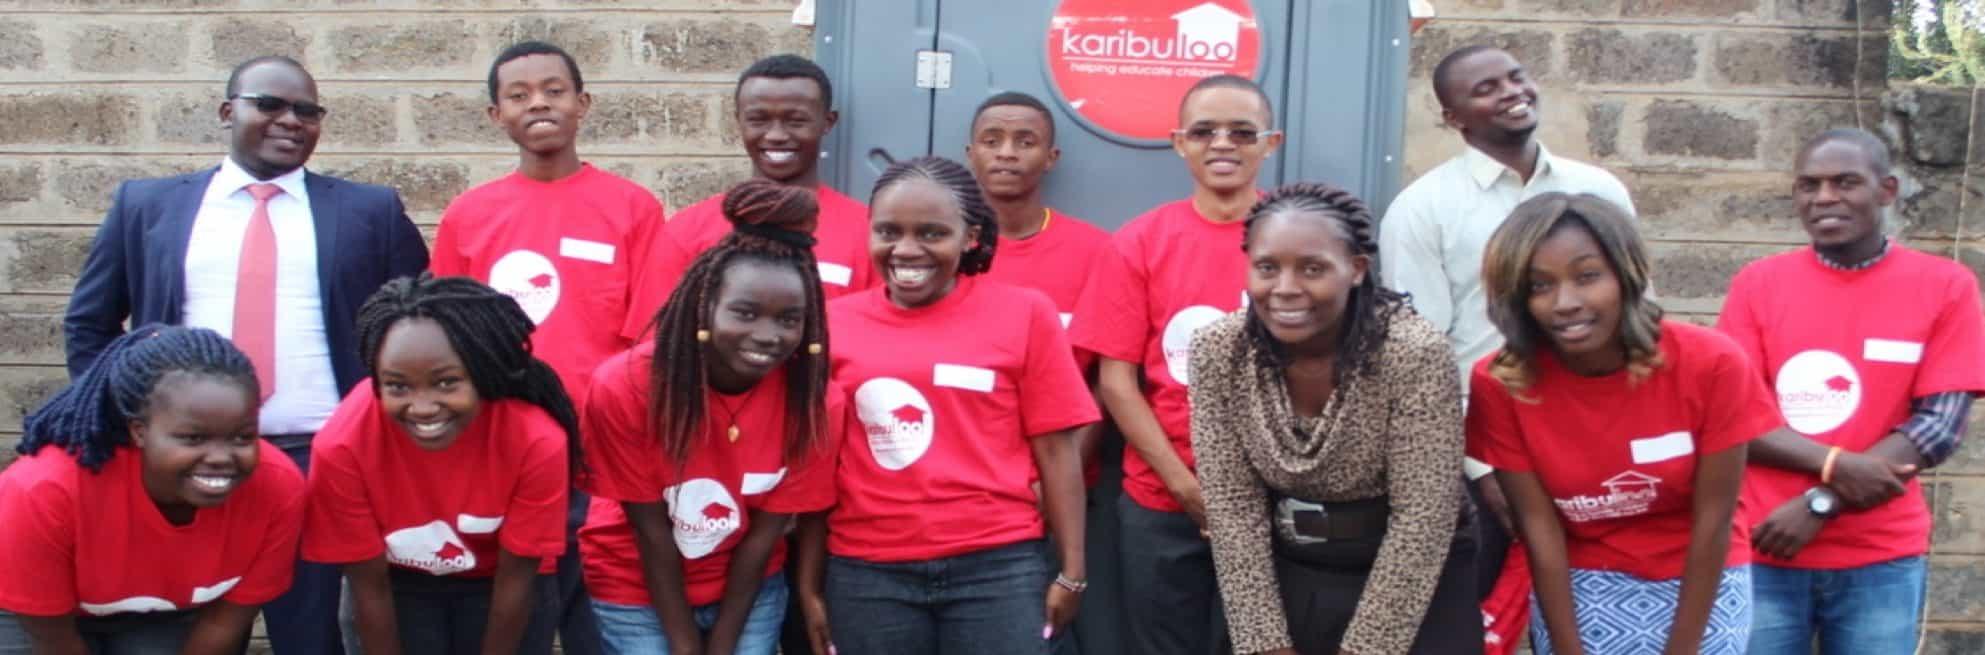 Karibu Loo Kenya Team